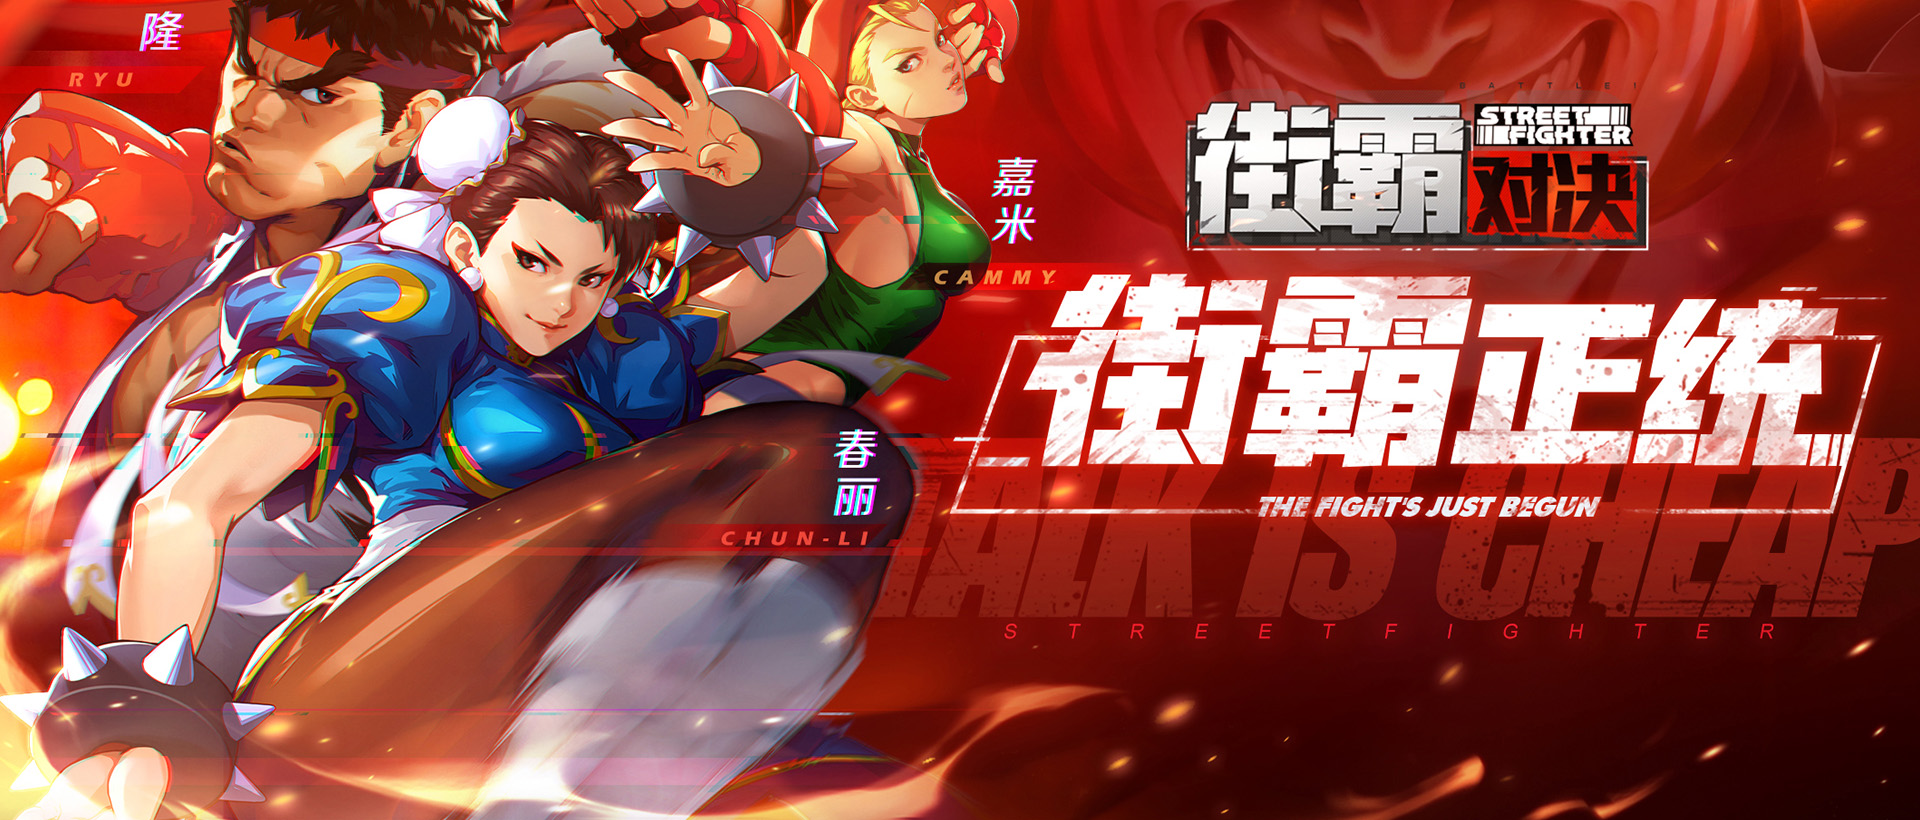 Street Fighter : Duel